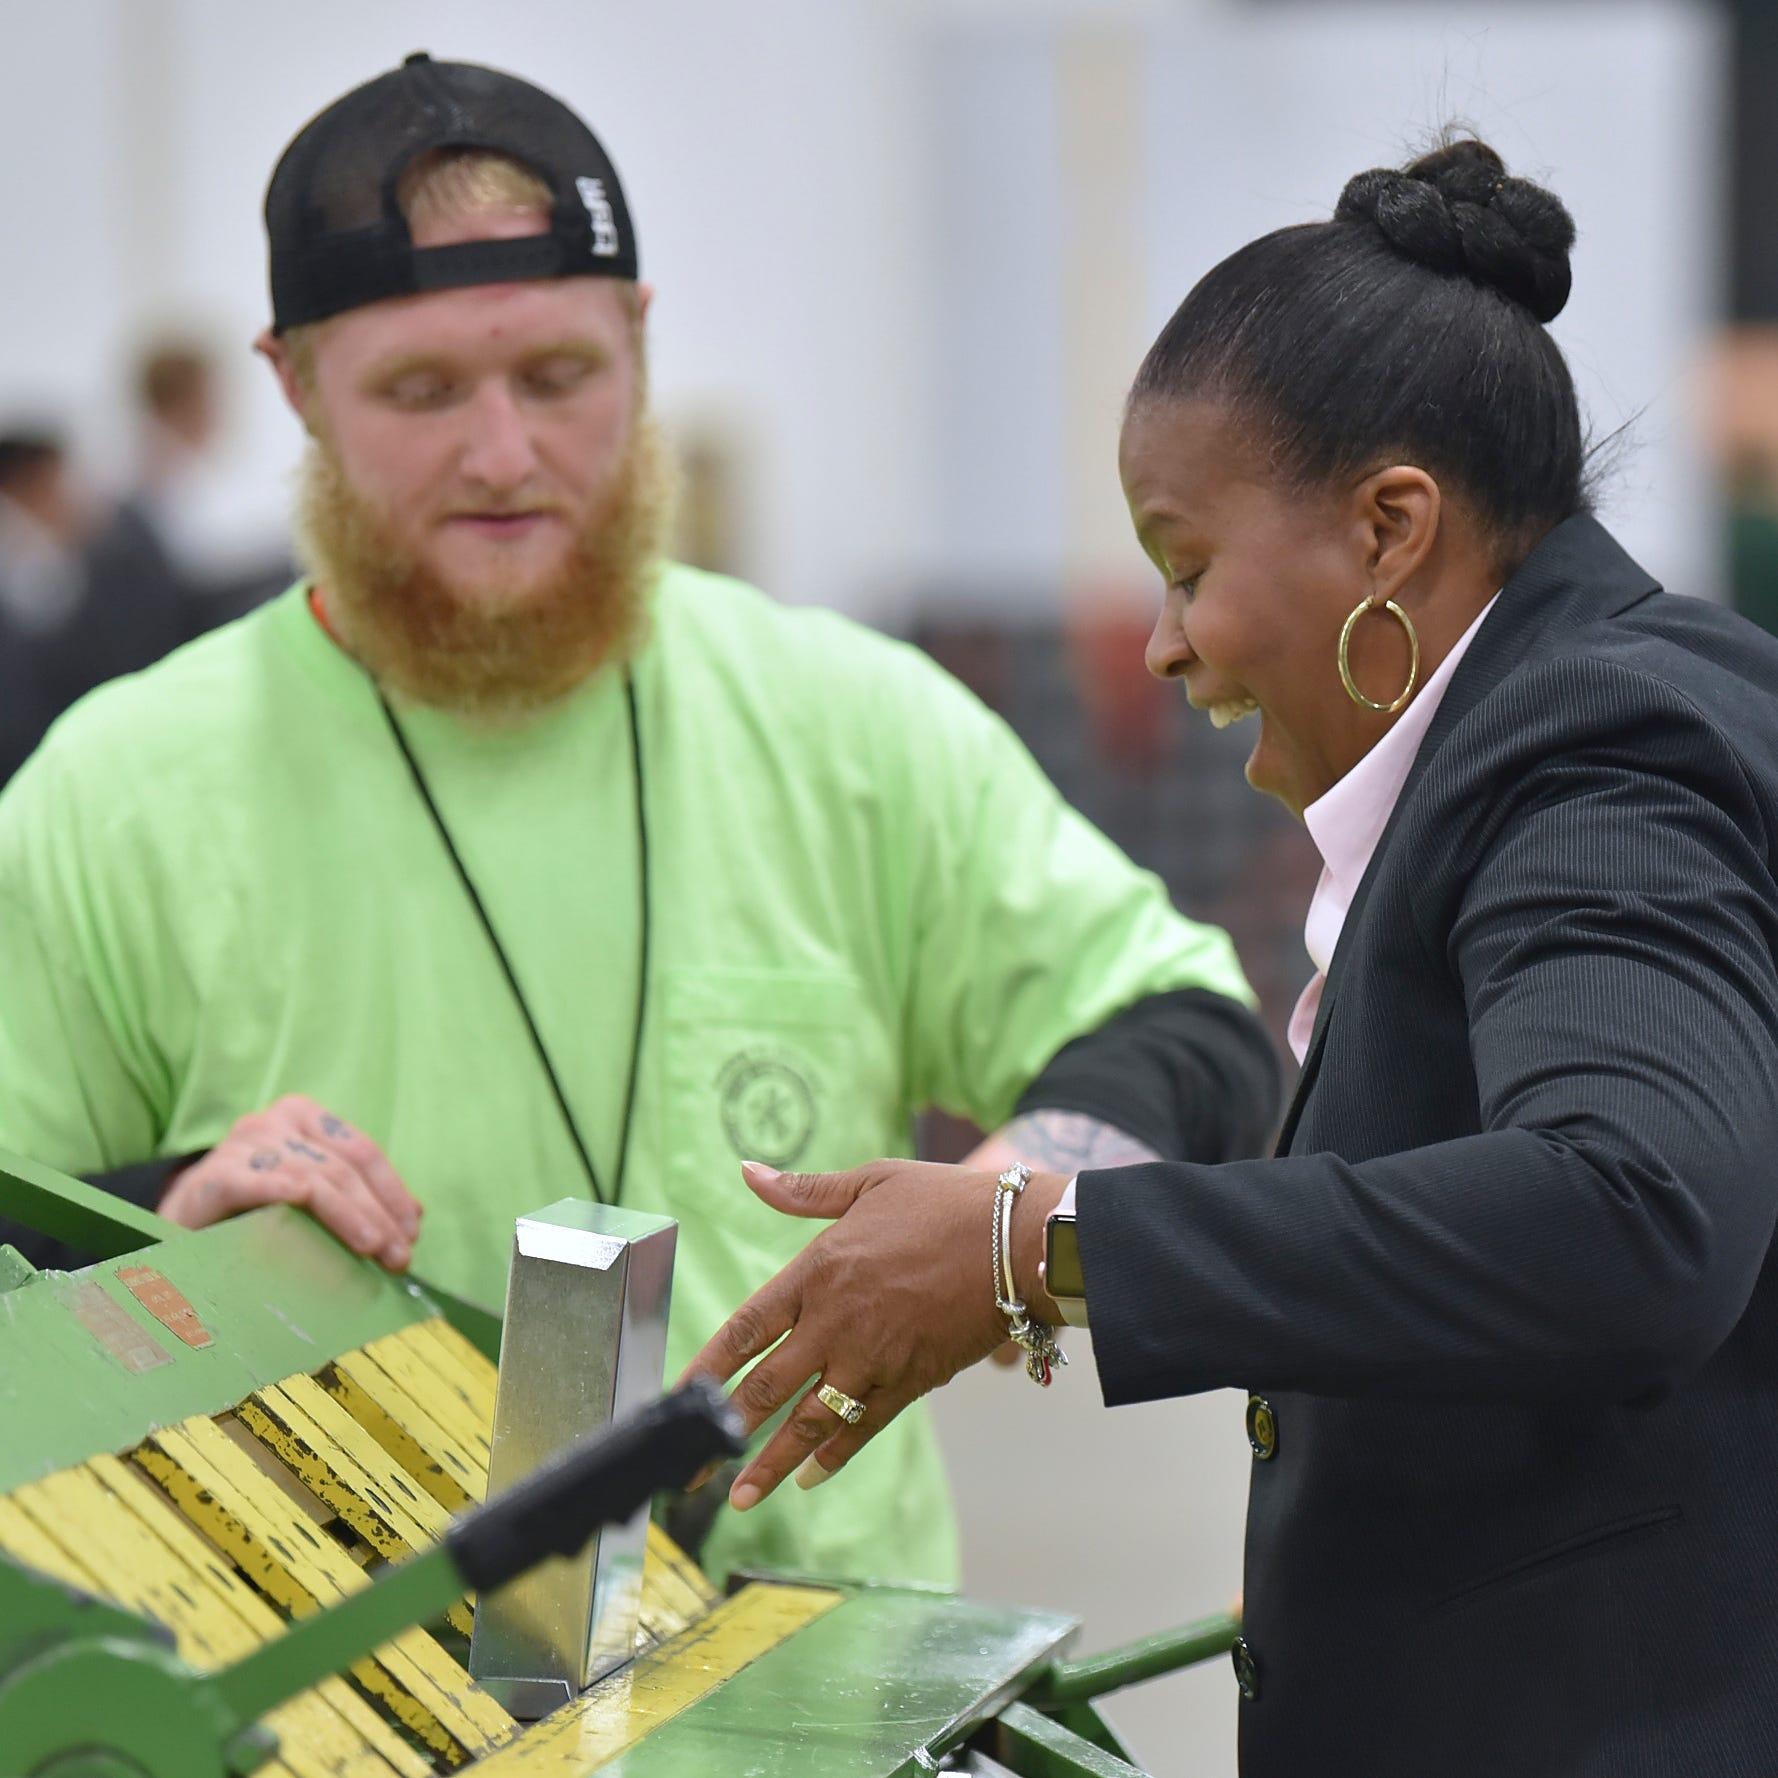 Hundreds explore construction trades at career expo